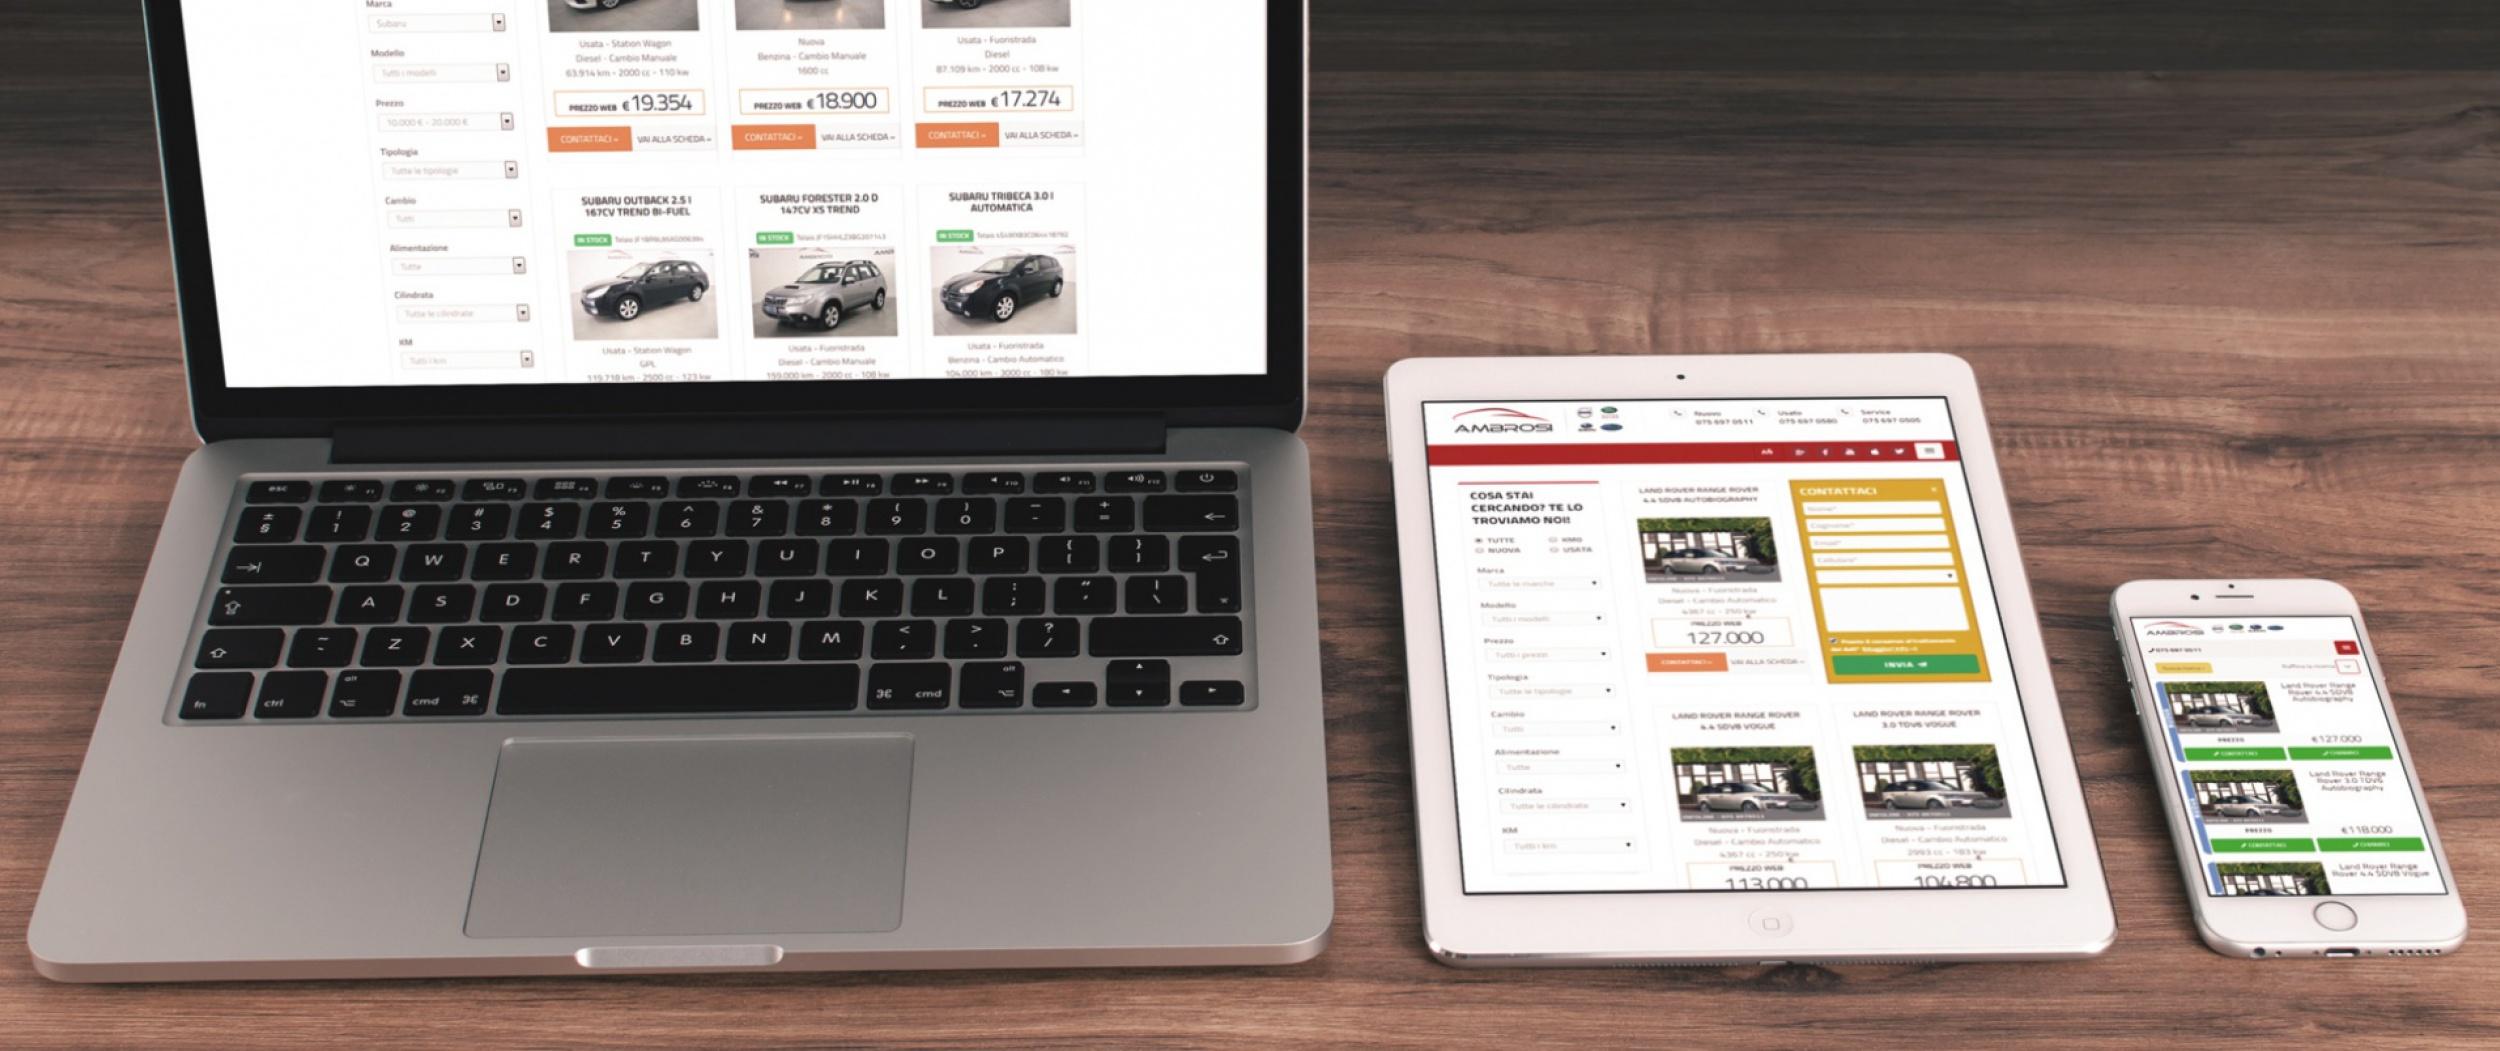 Siti web App Concessionarie Auto | Dealer Managers